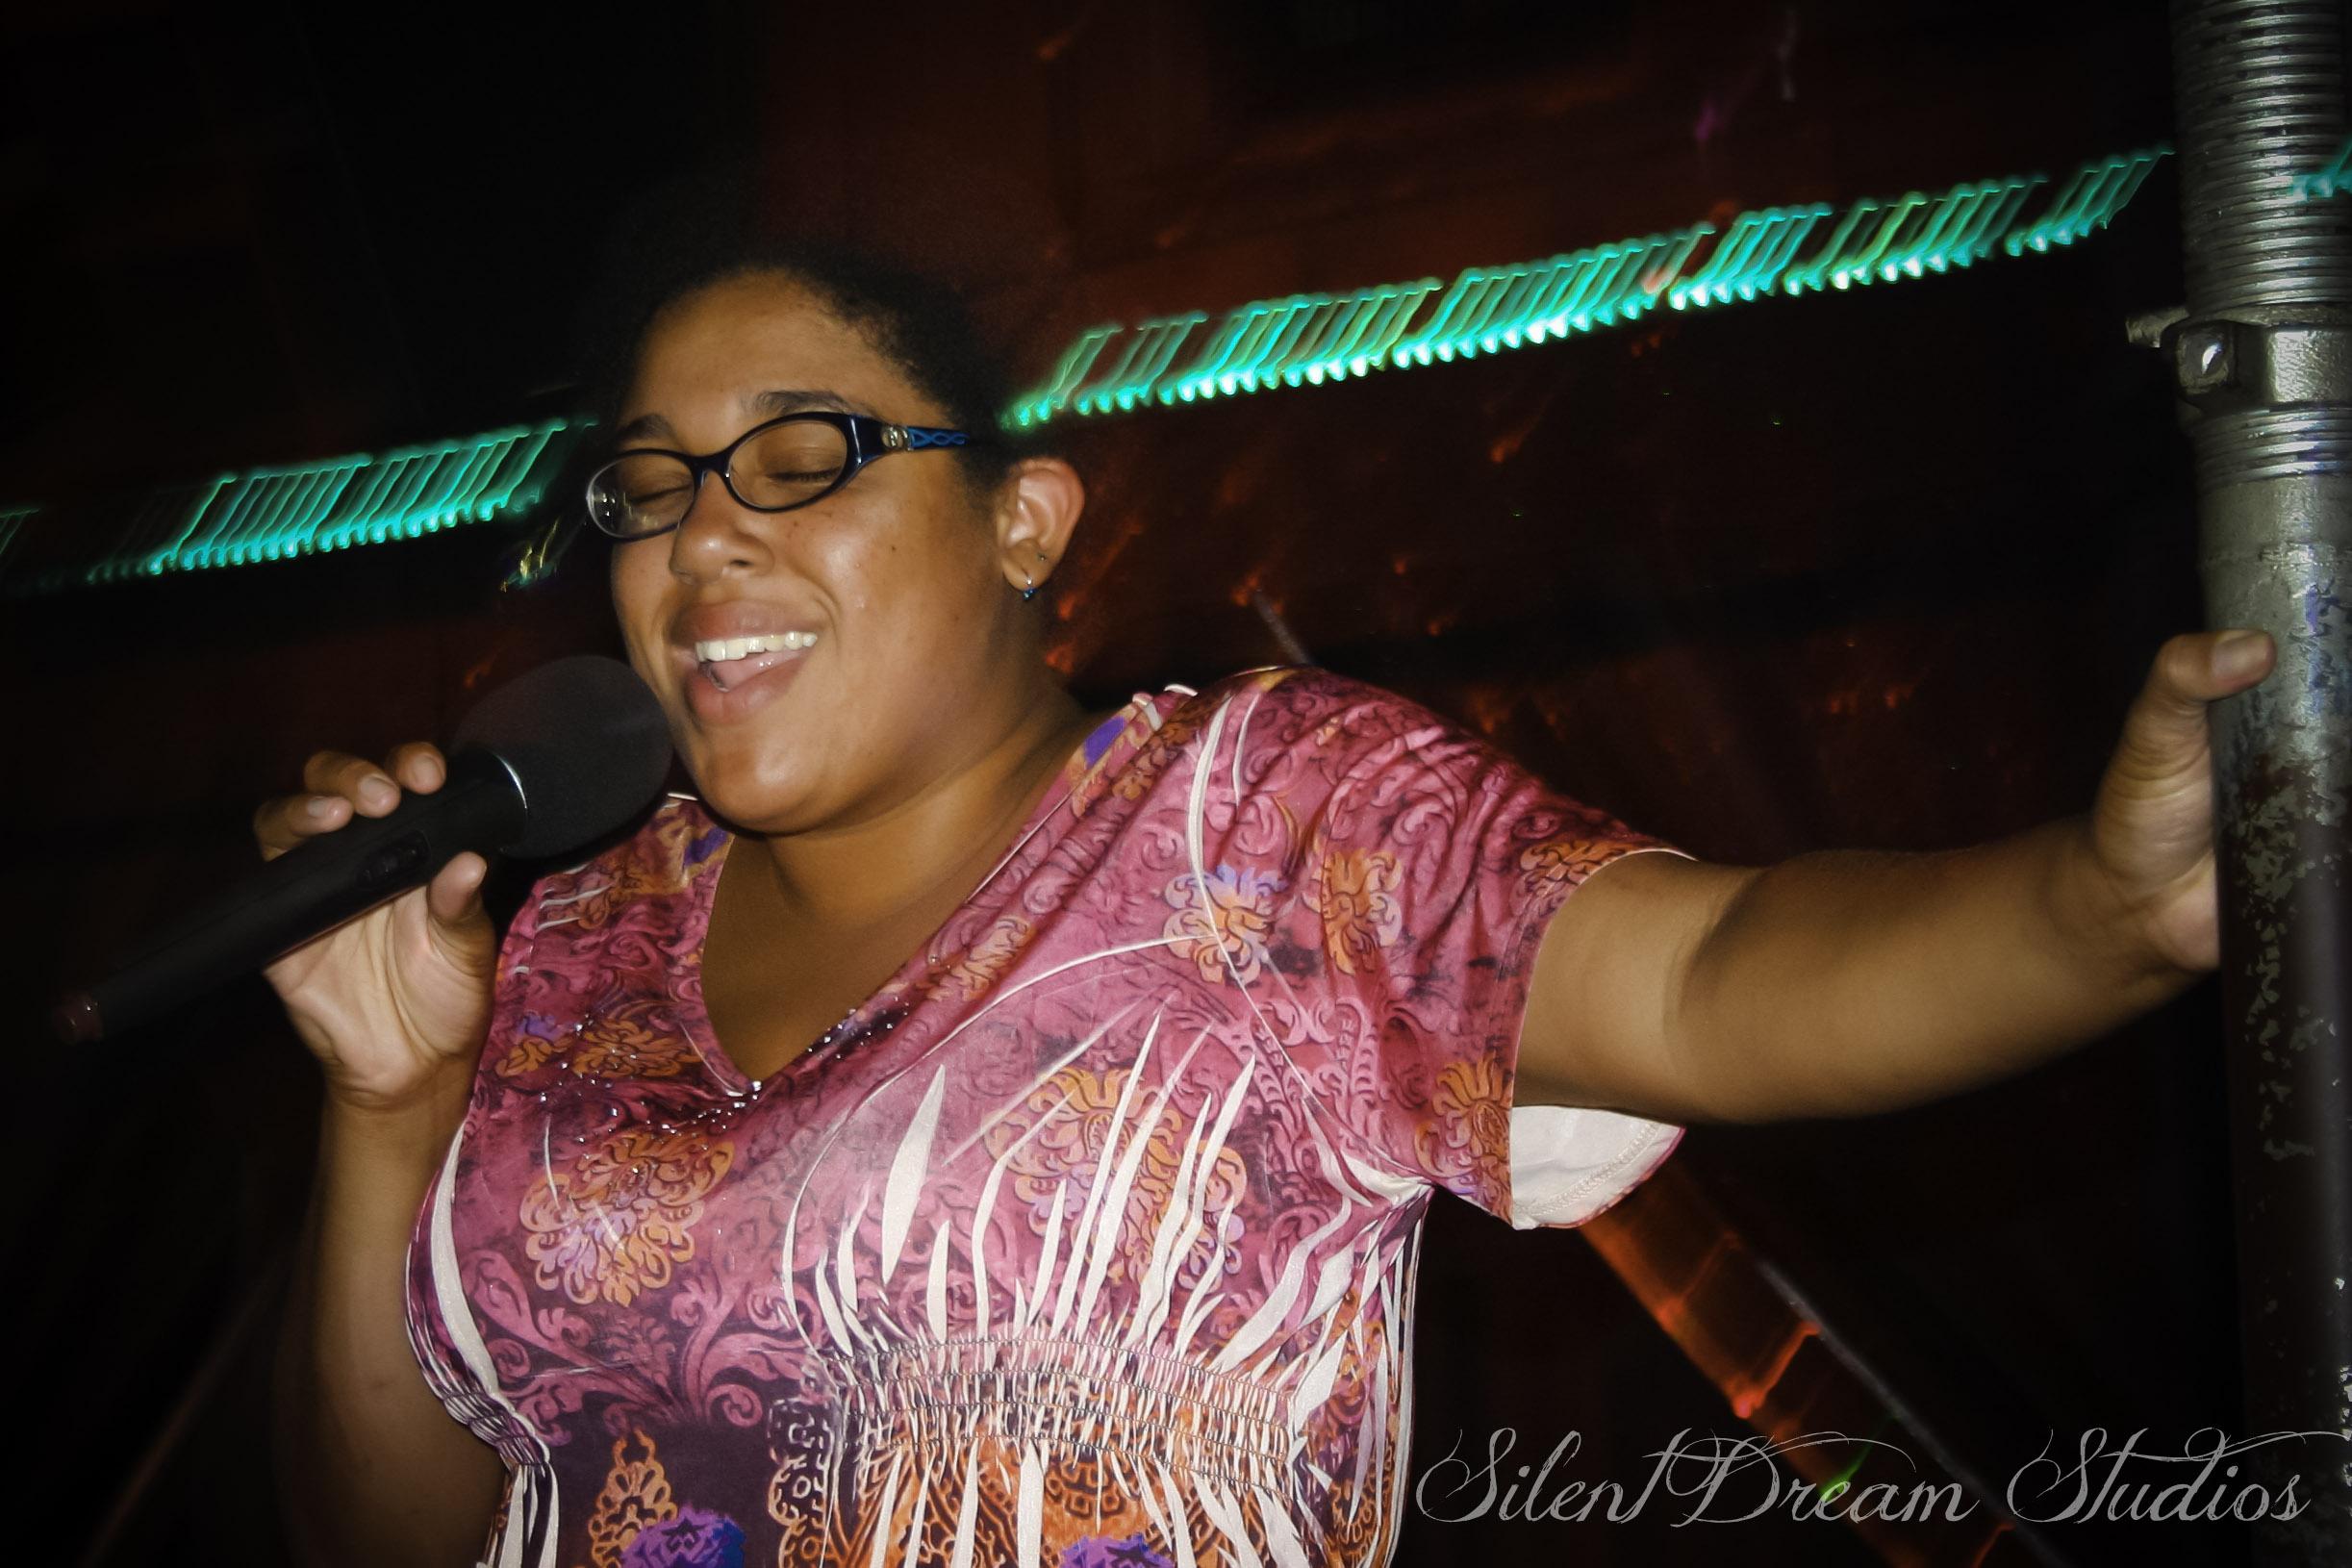 sing karaoke on Tuesday nights,